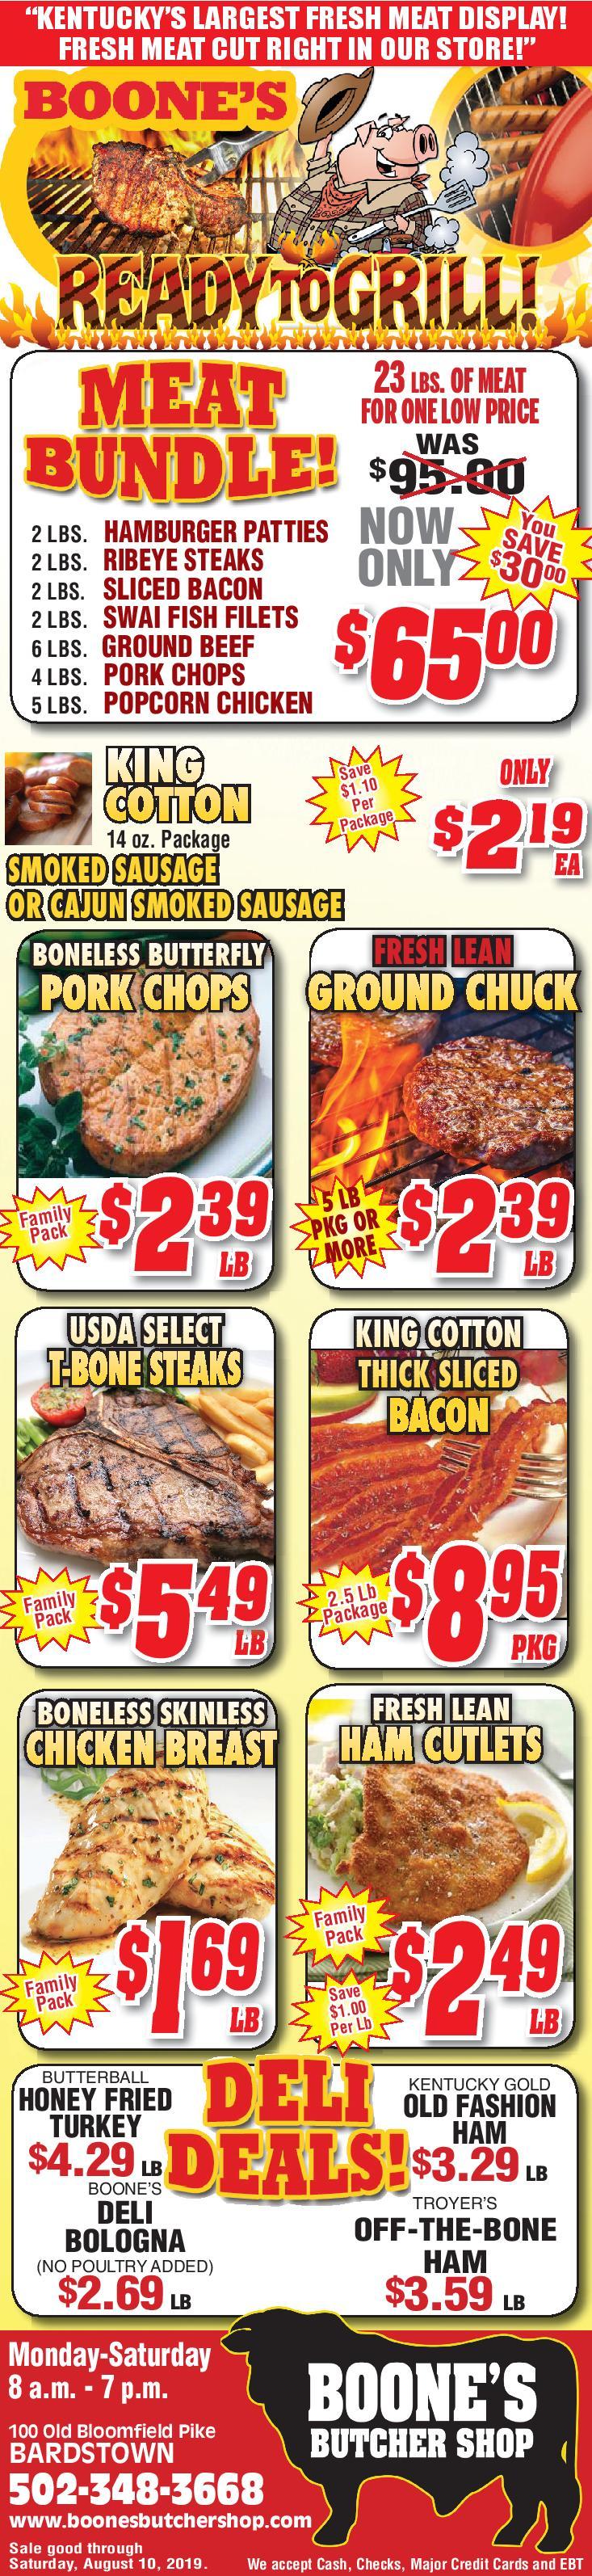 Boone's Butcher Shop | Bardstown Kentucky